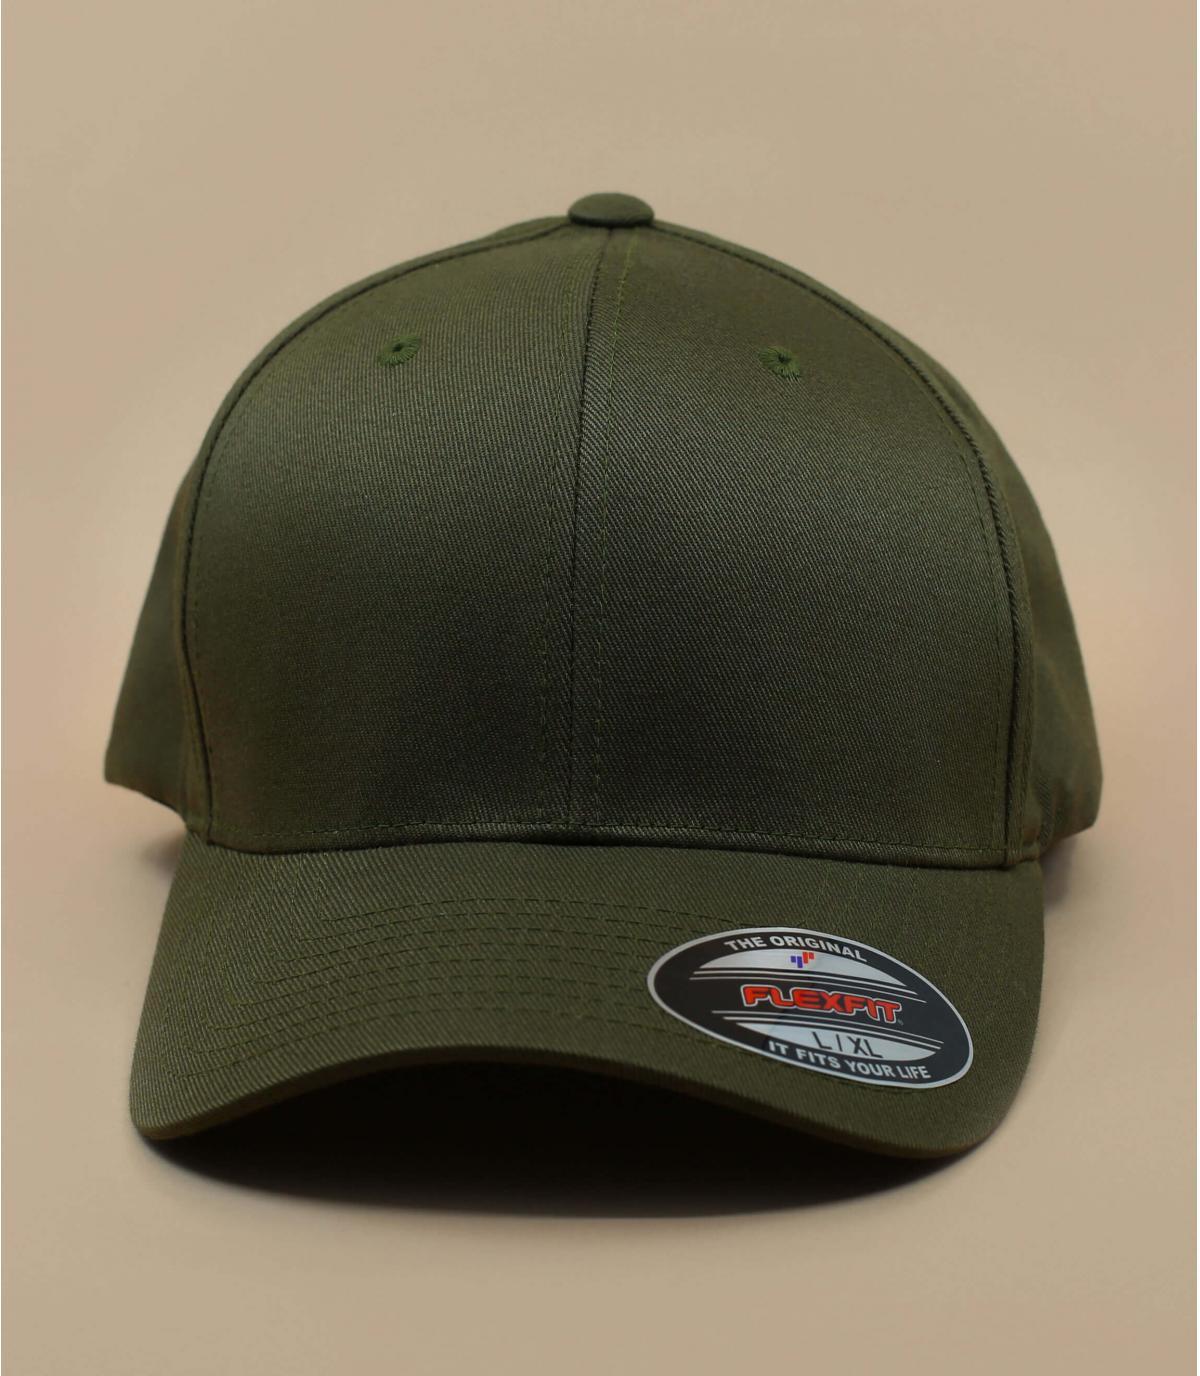 curva de tapa verde oliva